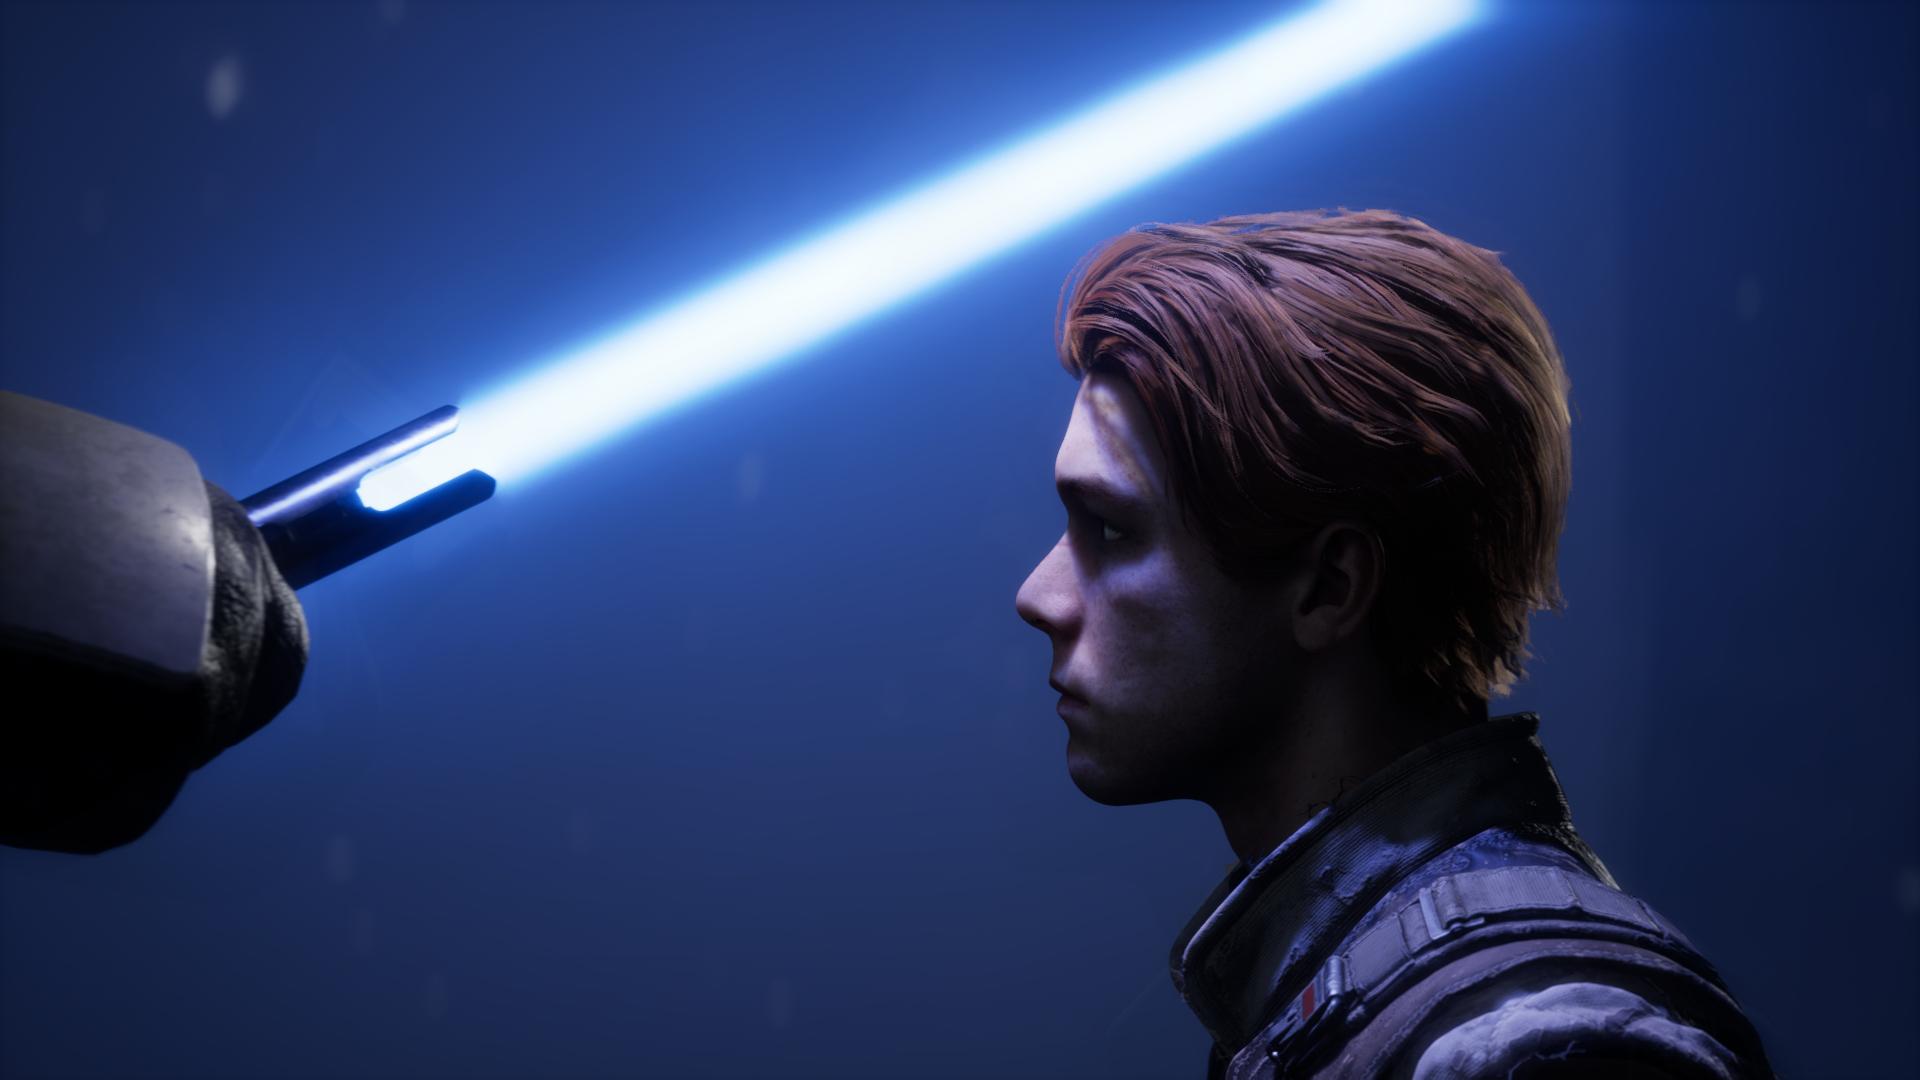 Star Wars Jedi: Fallen Order - Star Wars Jedi: Fallen Order